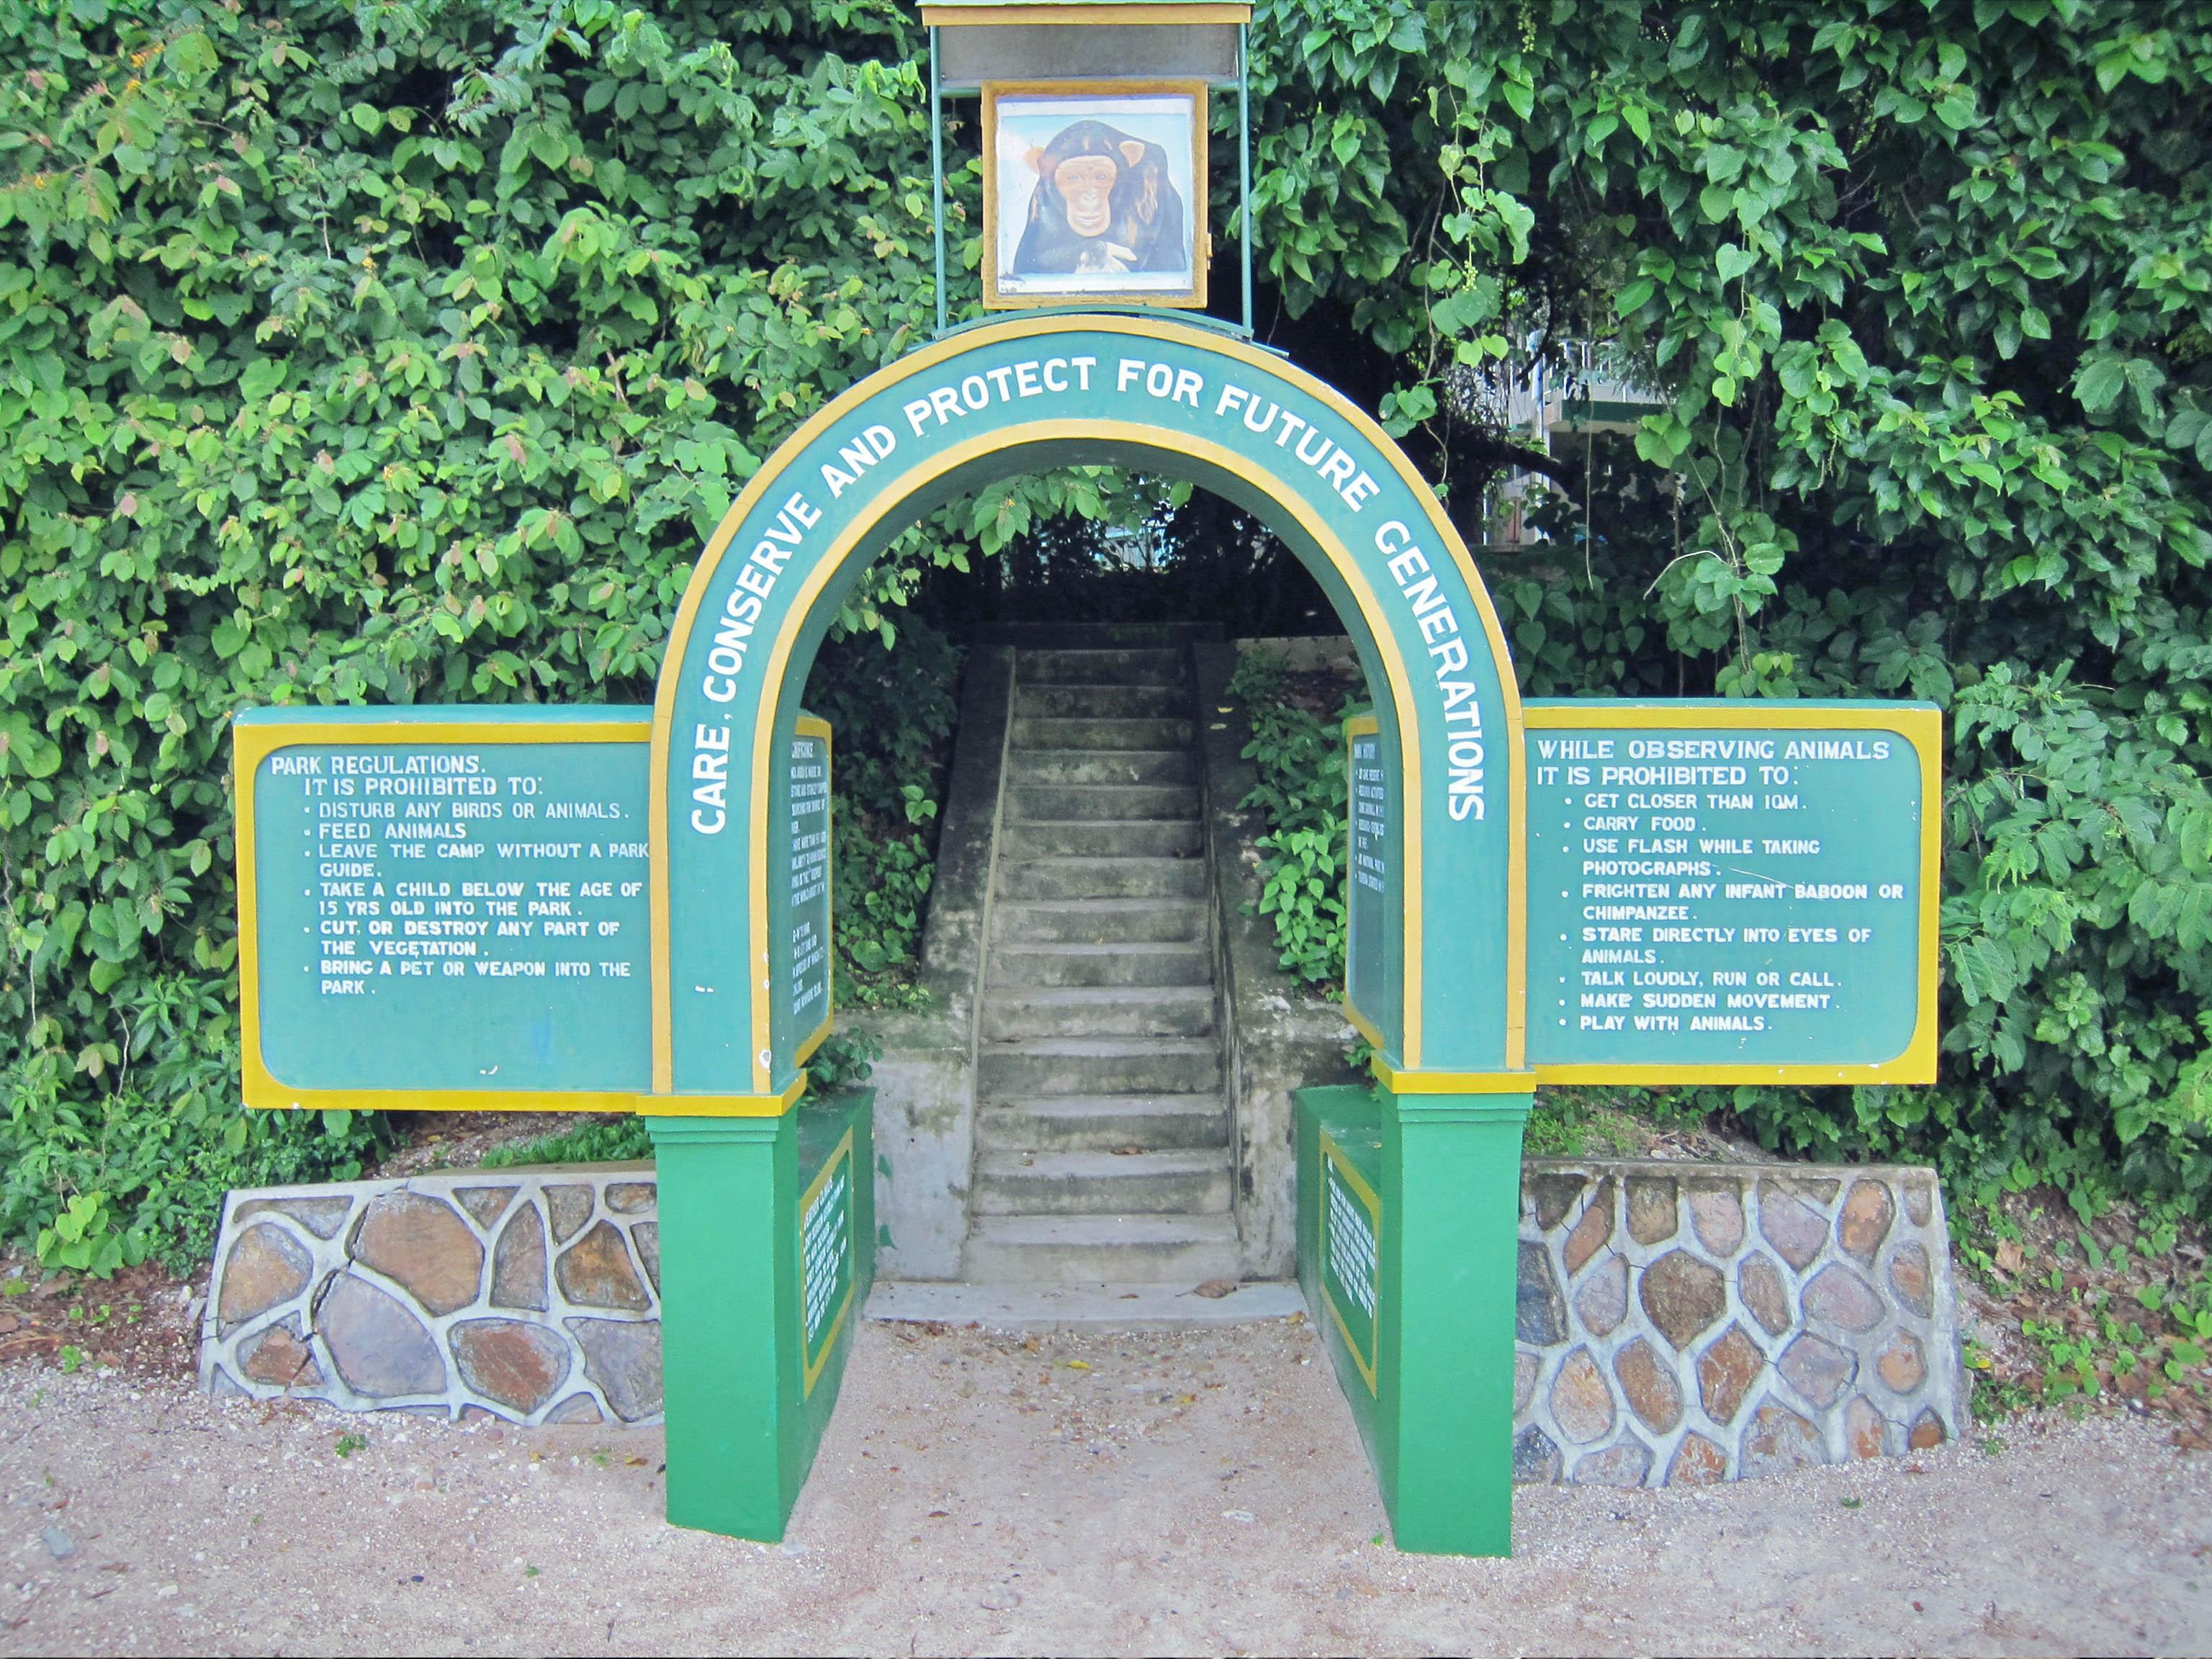 Gombe Stream Tanzania